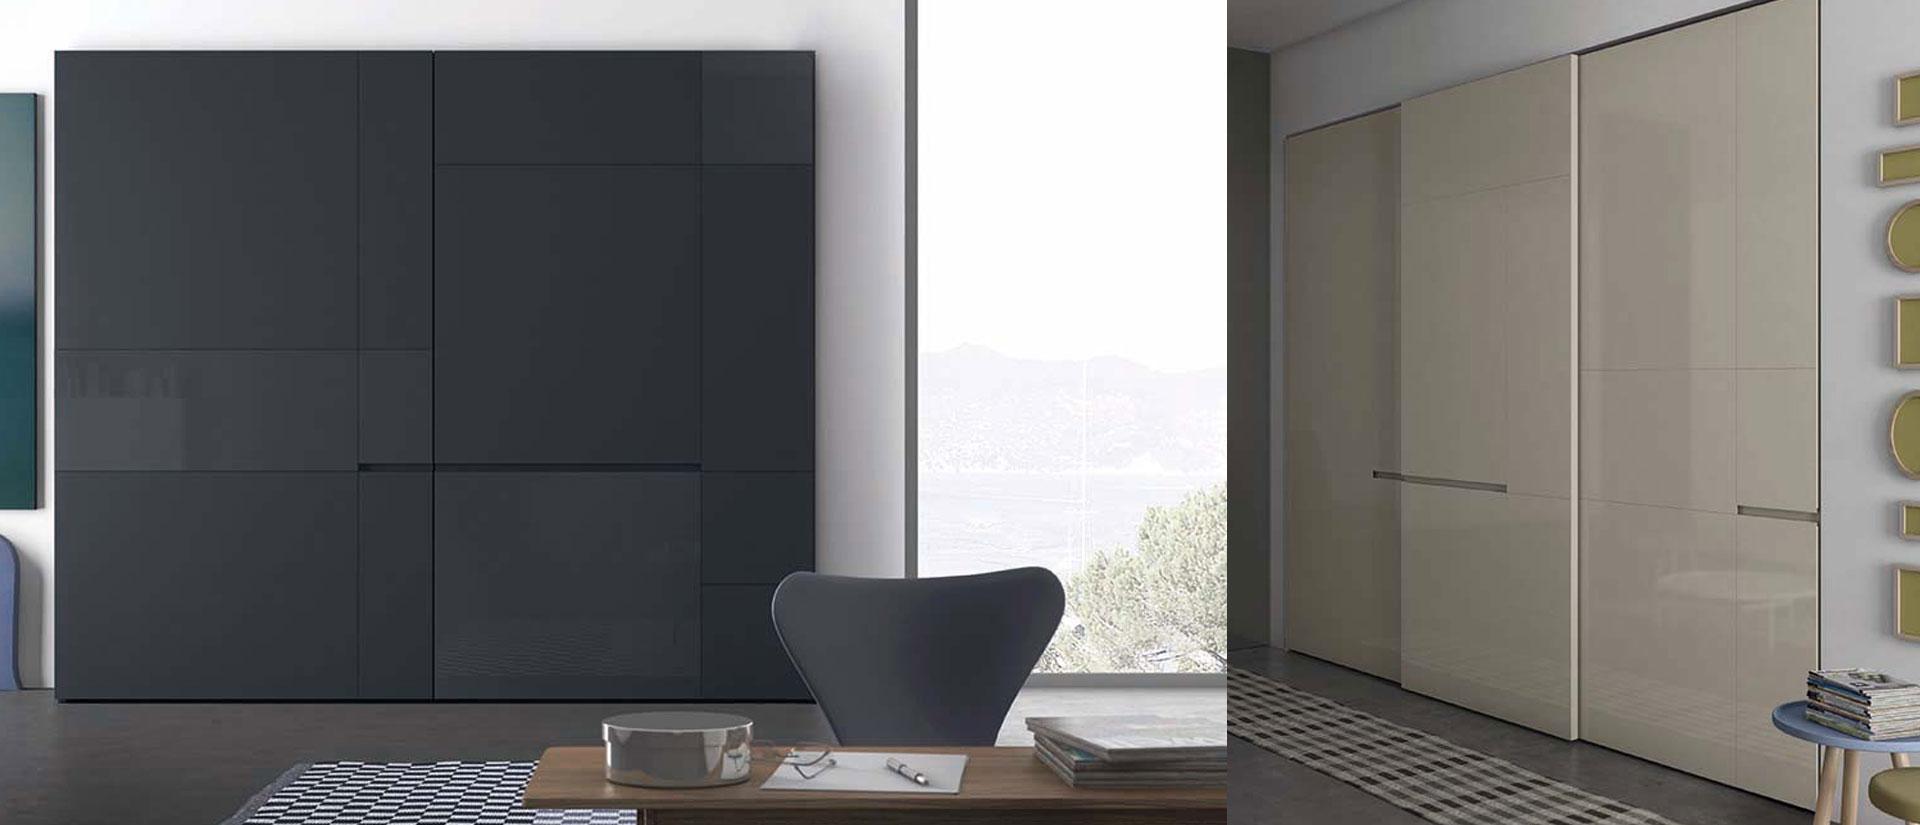 armadio-moderno-modello-crea-pianca-1